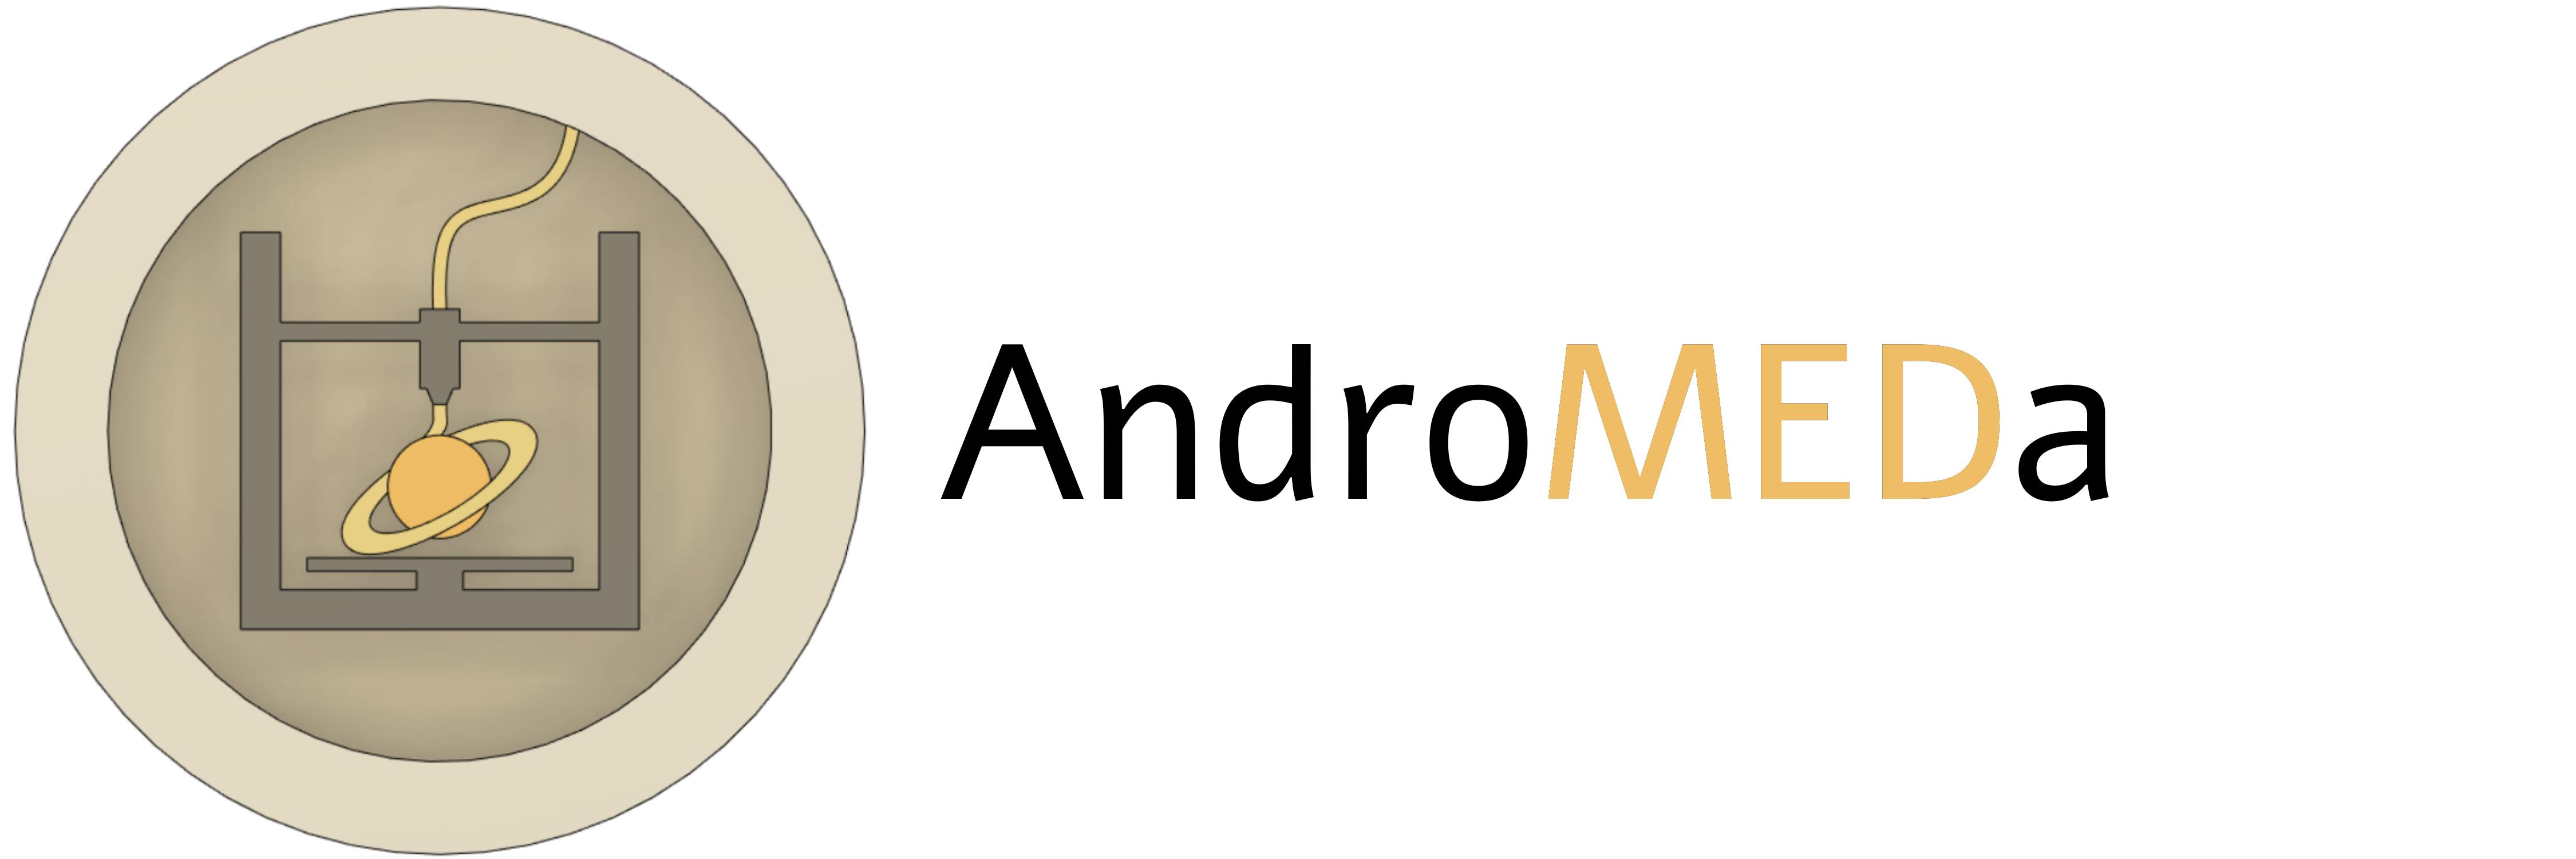 AndroMEDa Design